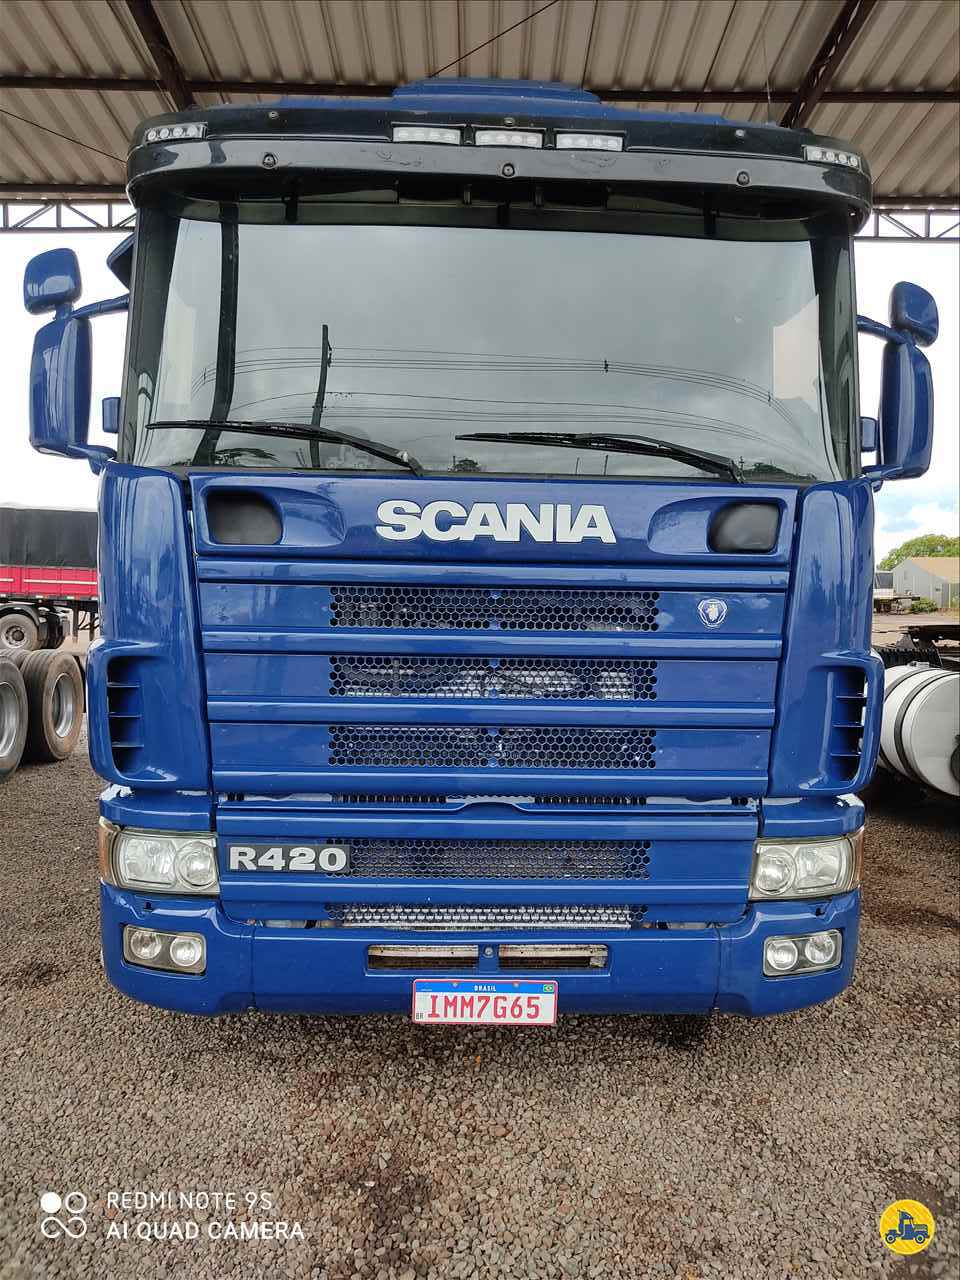 SCANIA SCANIA 124 420 0km 2005/2005 Rodomati Caminhões